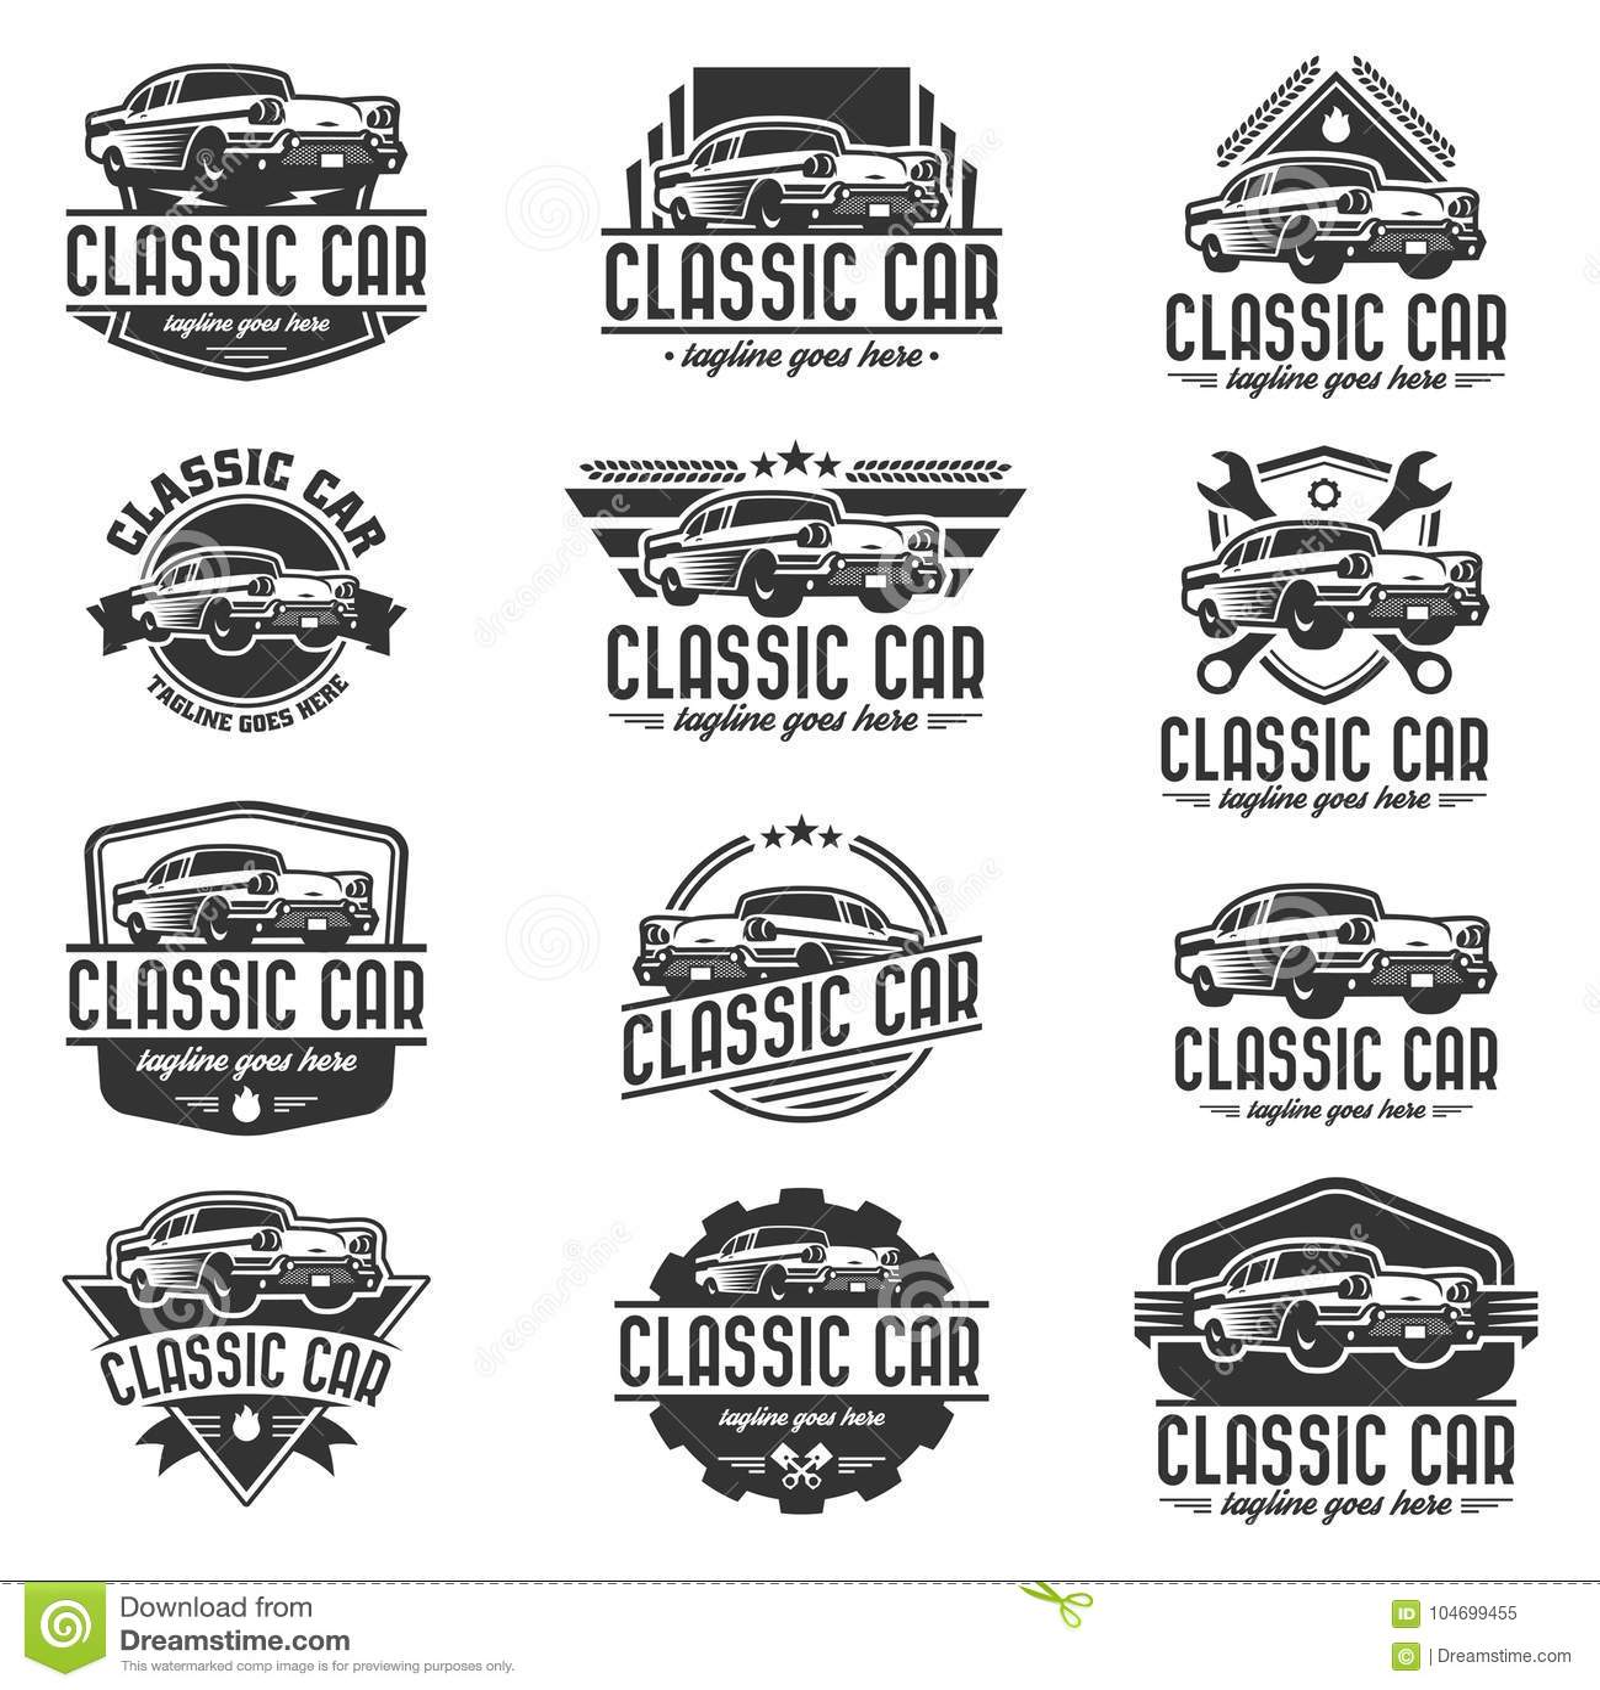 Classic Car Logo Template, Vintage Car Logo, Retro Car